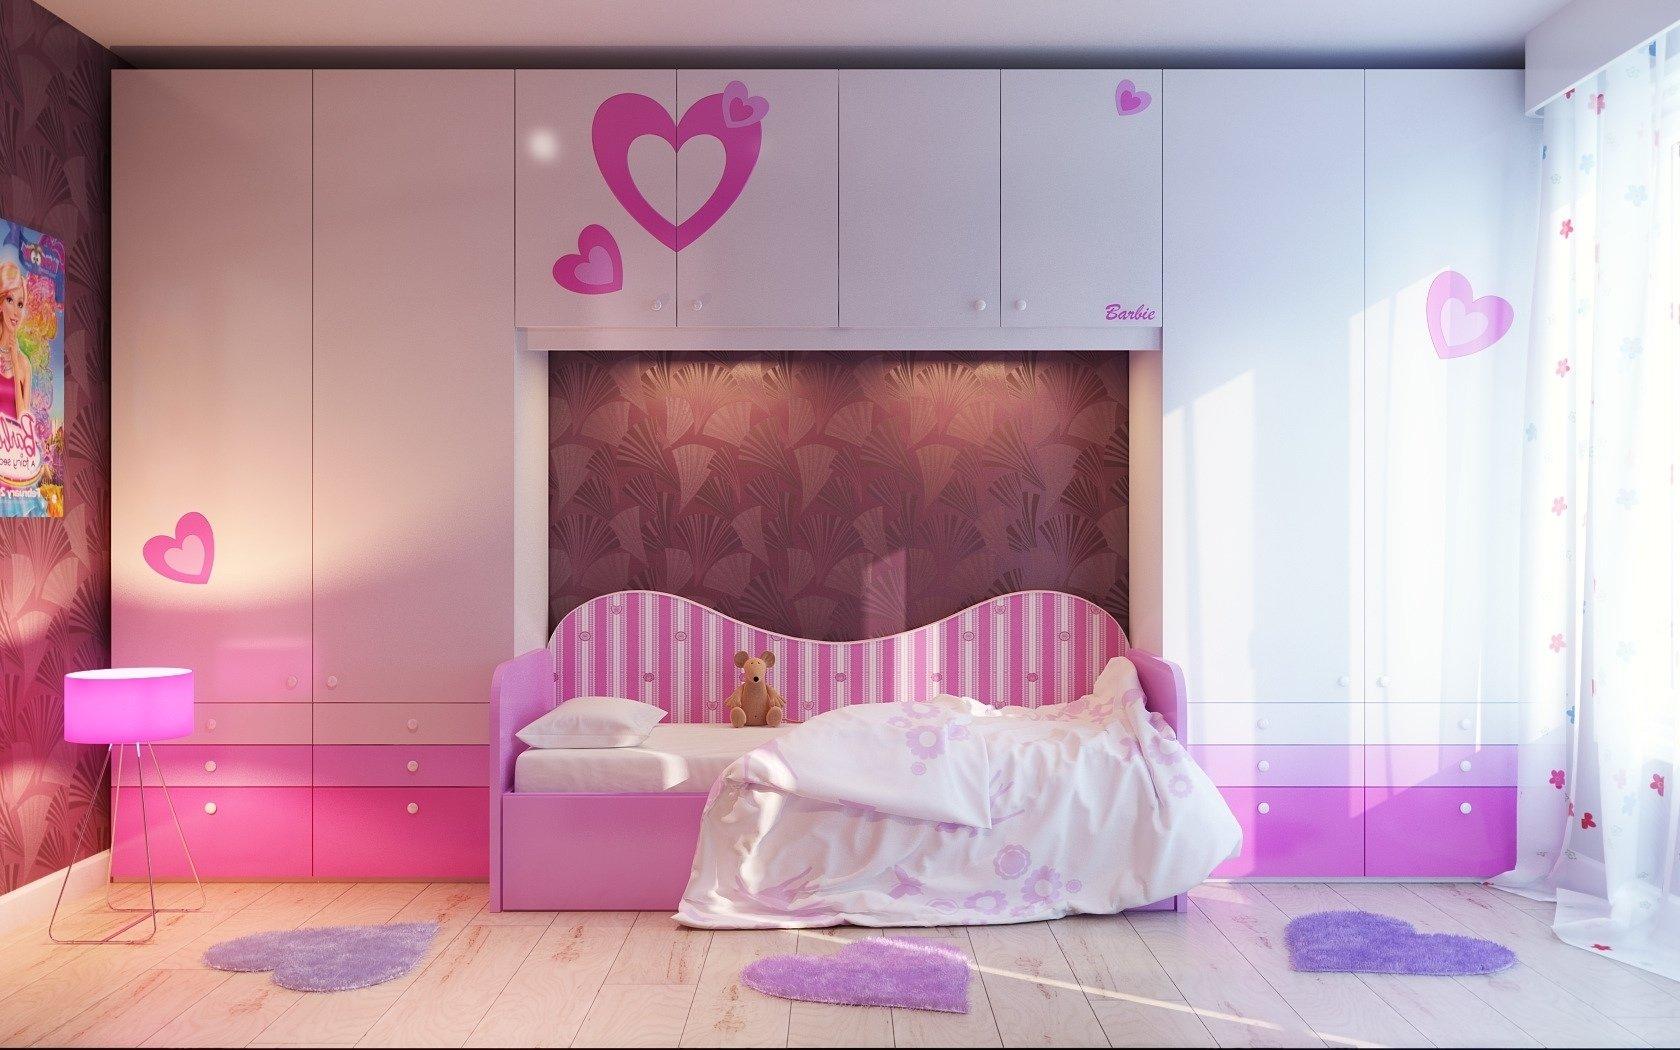 10 Lovable Cute Bedroom Ideas For Girls cute girls bedroom decorating ideas decobizz 2020